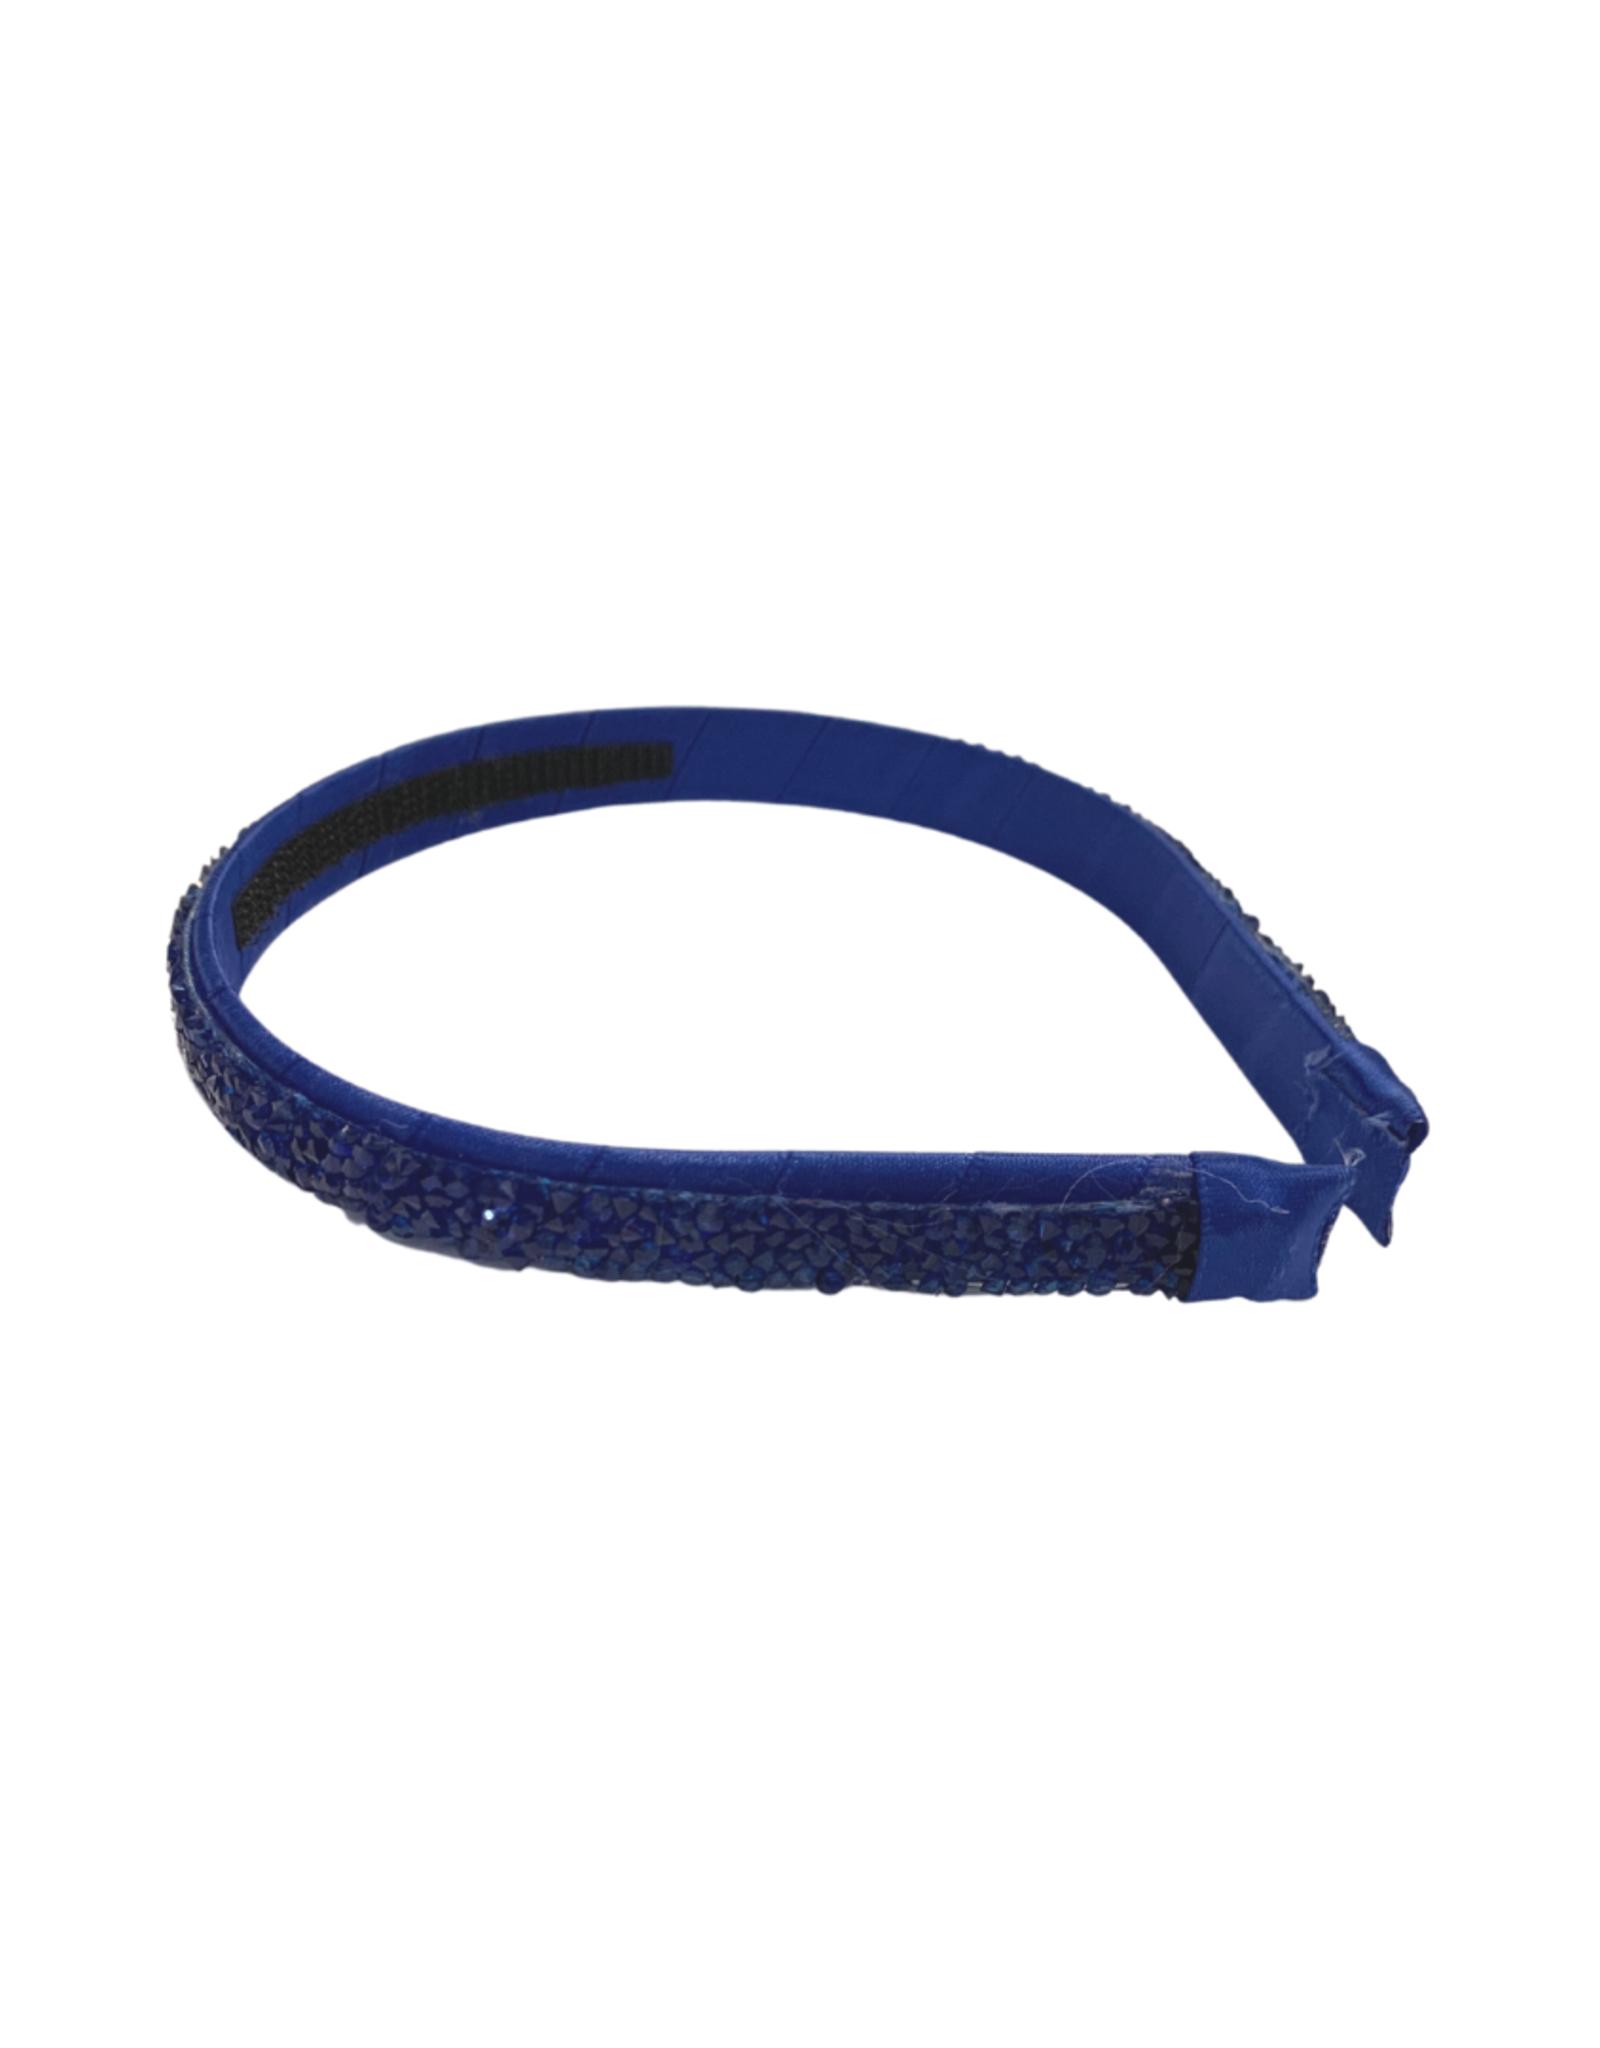 Bows Arts Druzy Quartz Headband - Royal